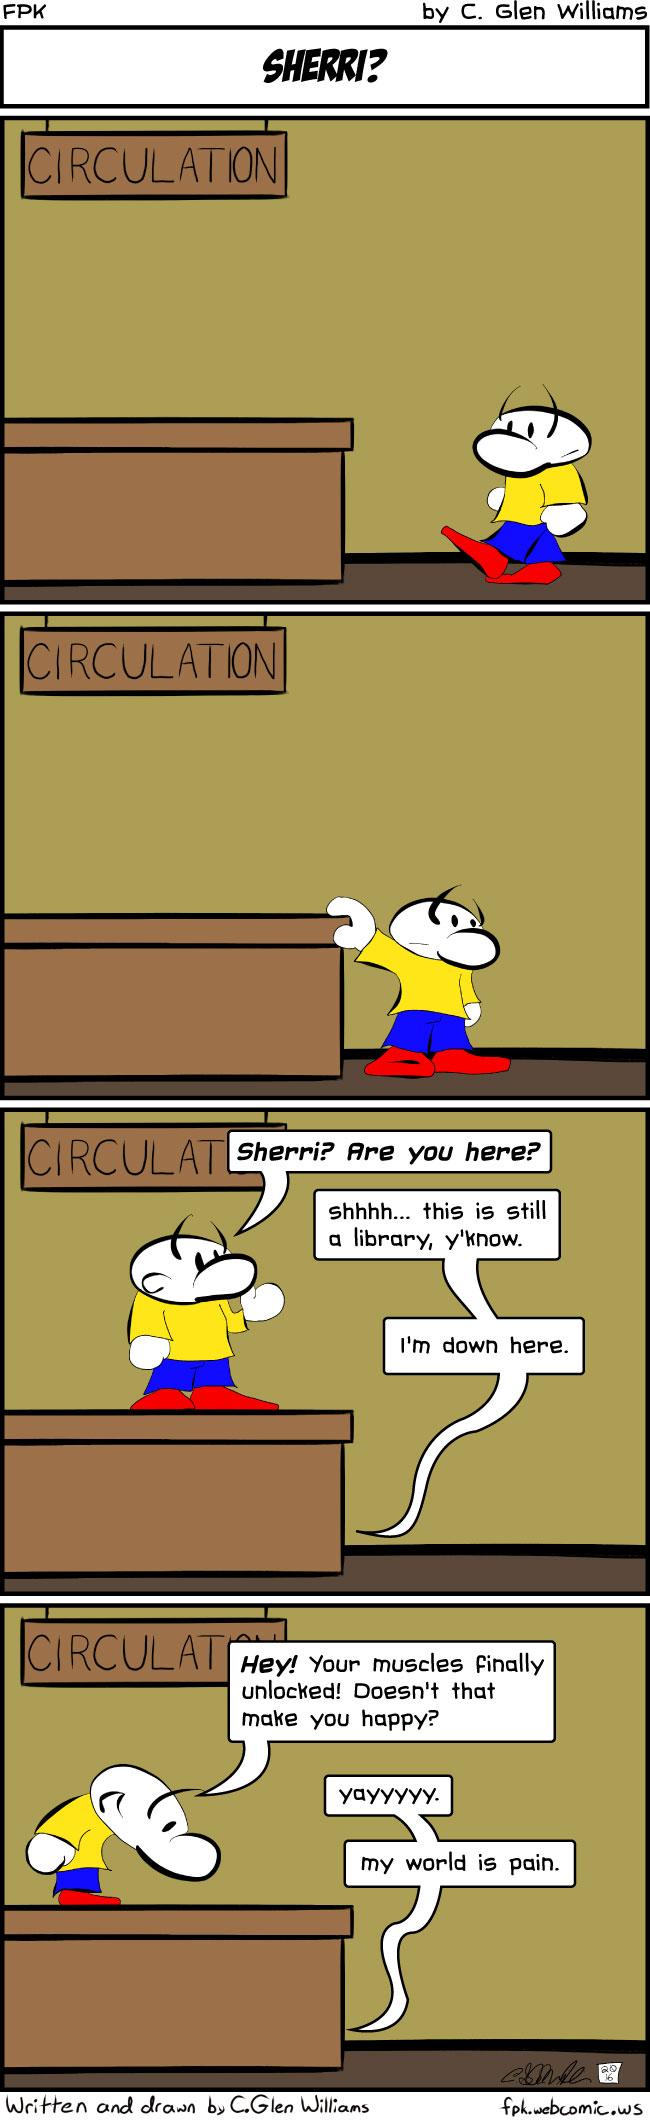 Sherri?